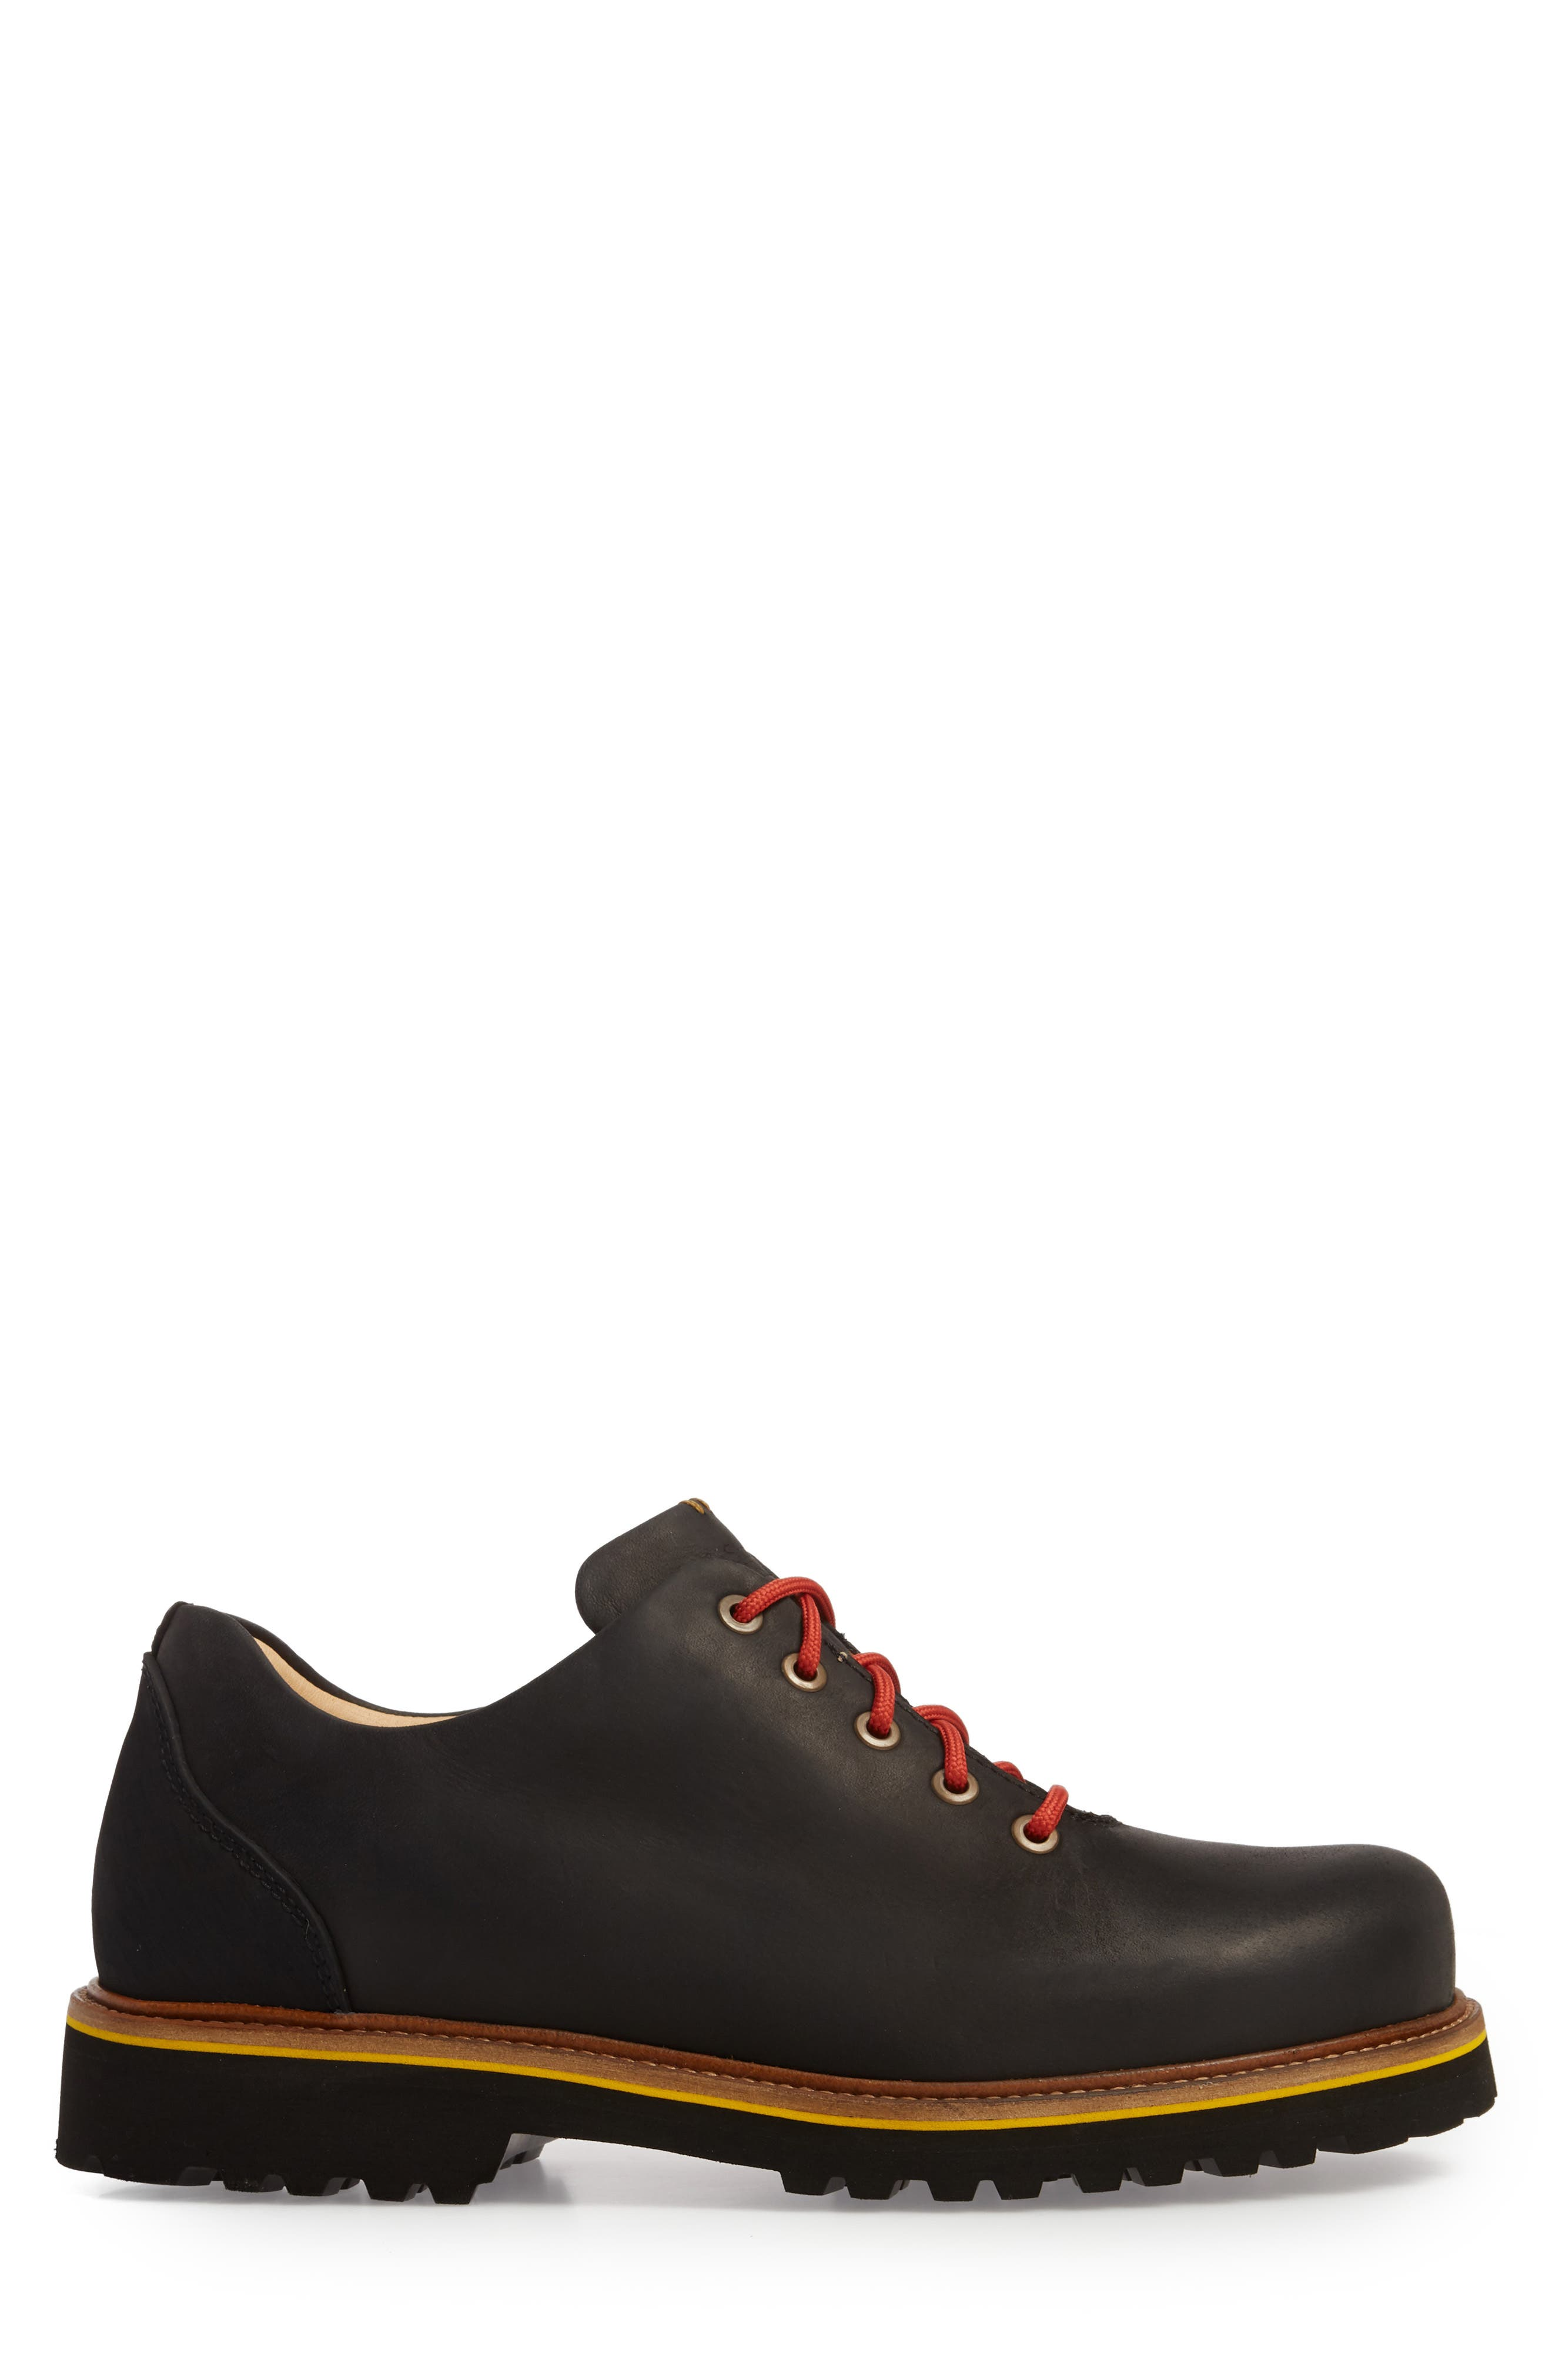 Fresh Plain Toe Oxford,                             Alternate thumbnail 3, color,                             BLACK WAXED LEATHER